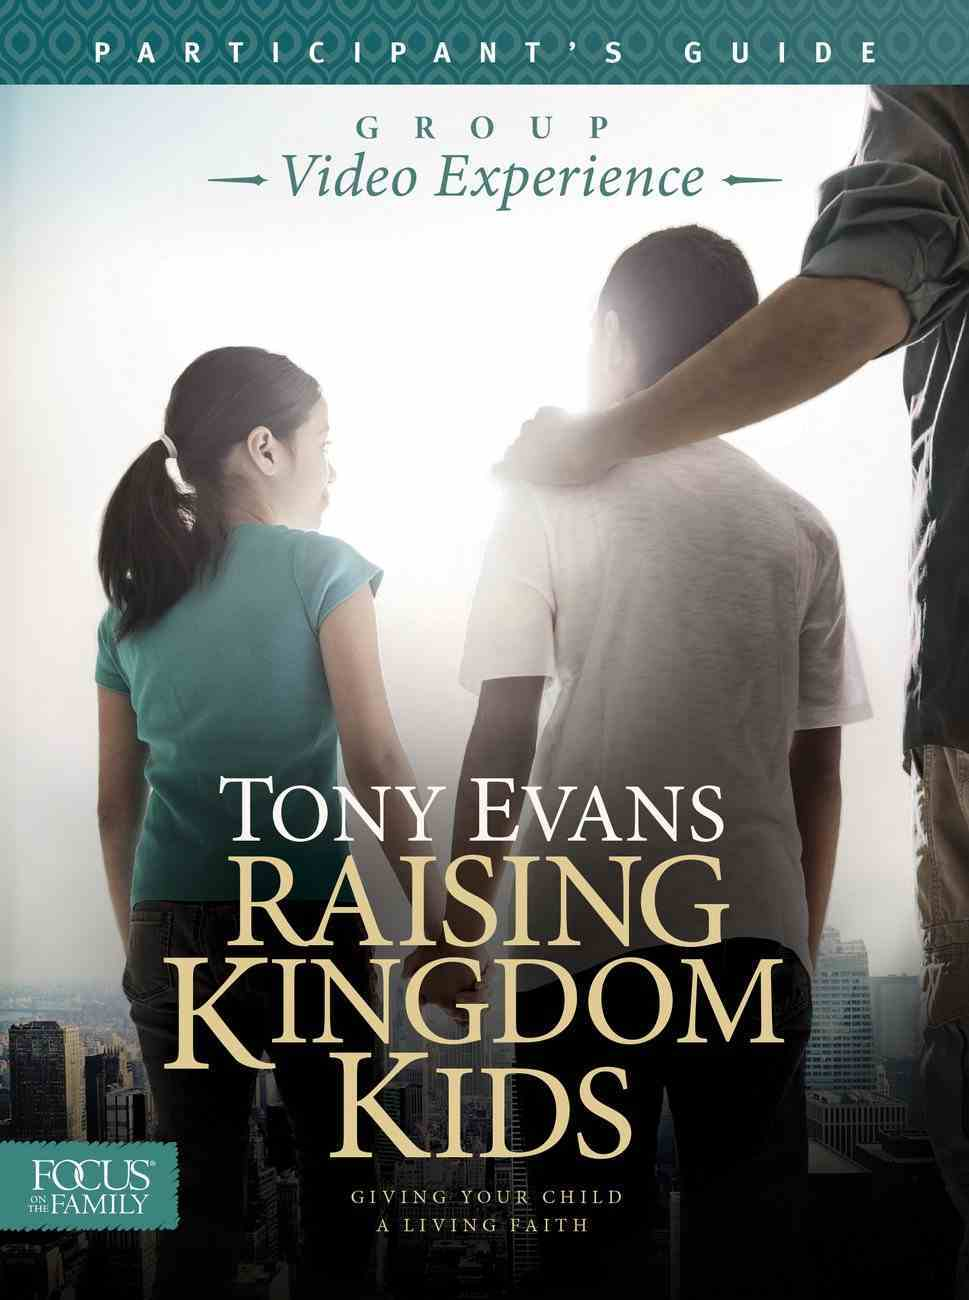 Raising Kingdom Kids (Dvd Curriculum And Study Guide) DVD